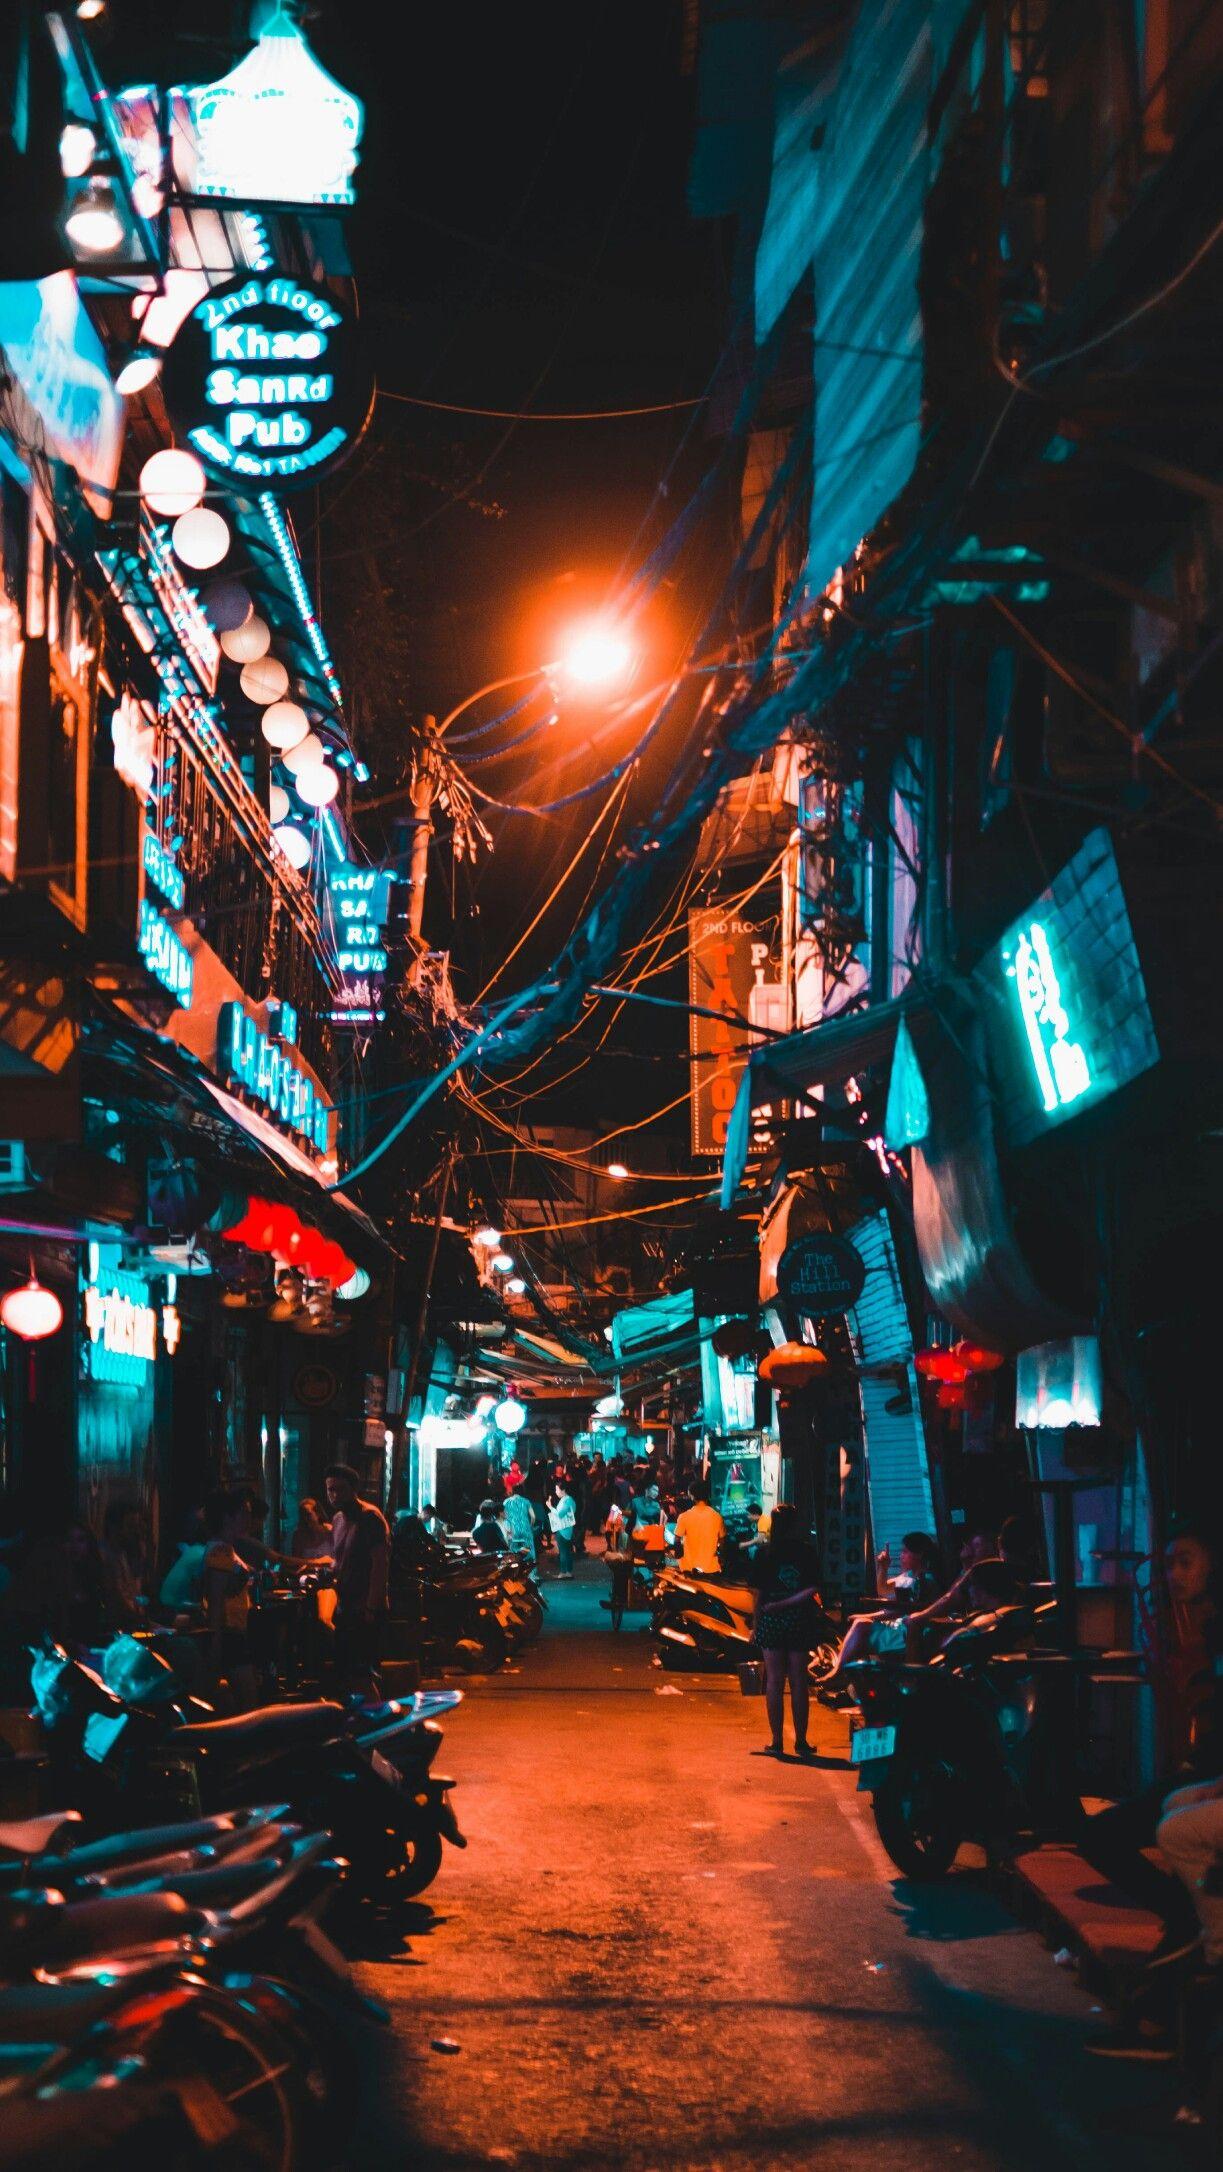 Nightlife Travel Travellight City Light Aesthetic Blue